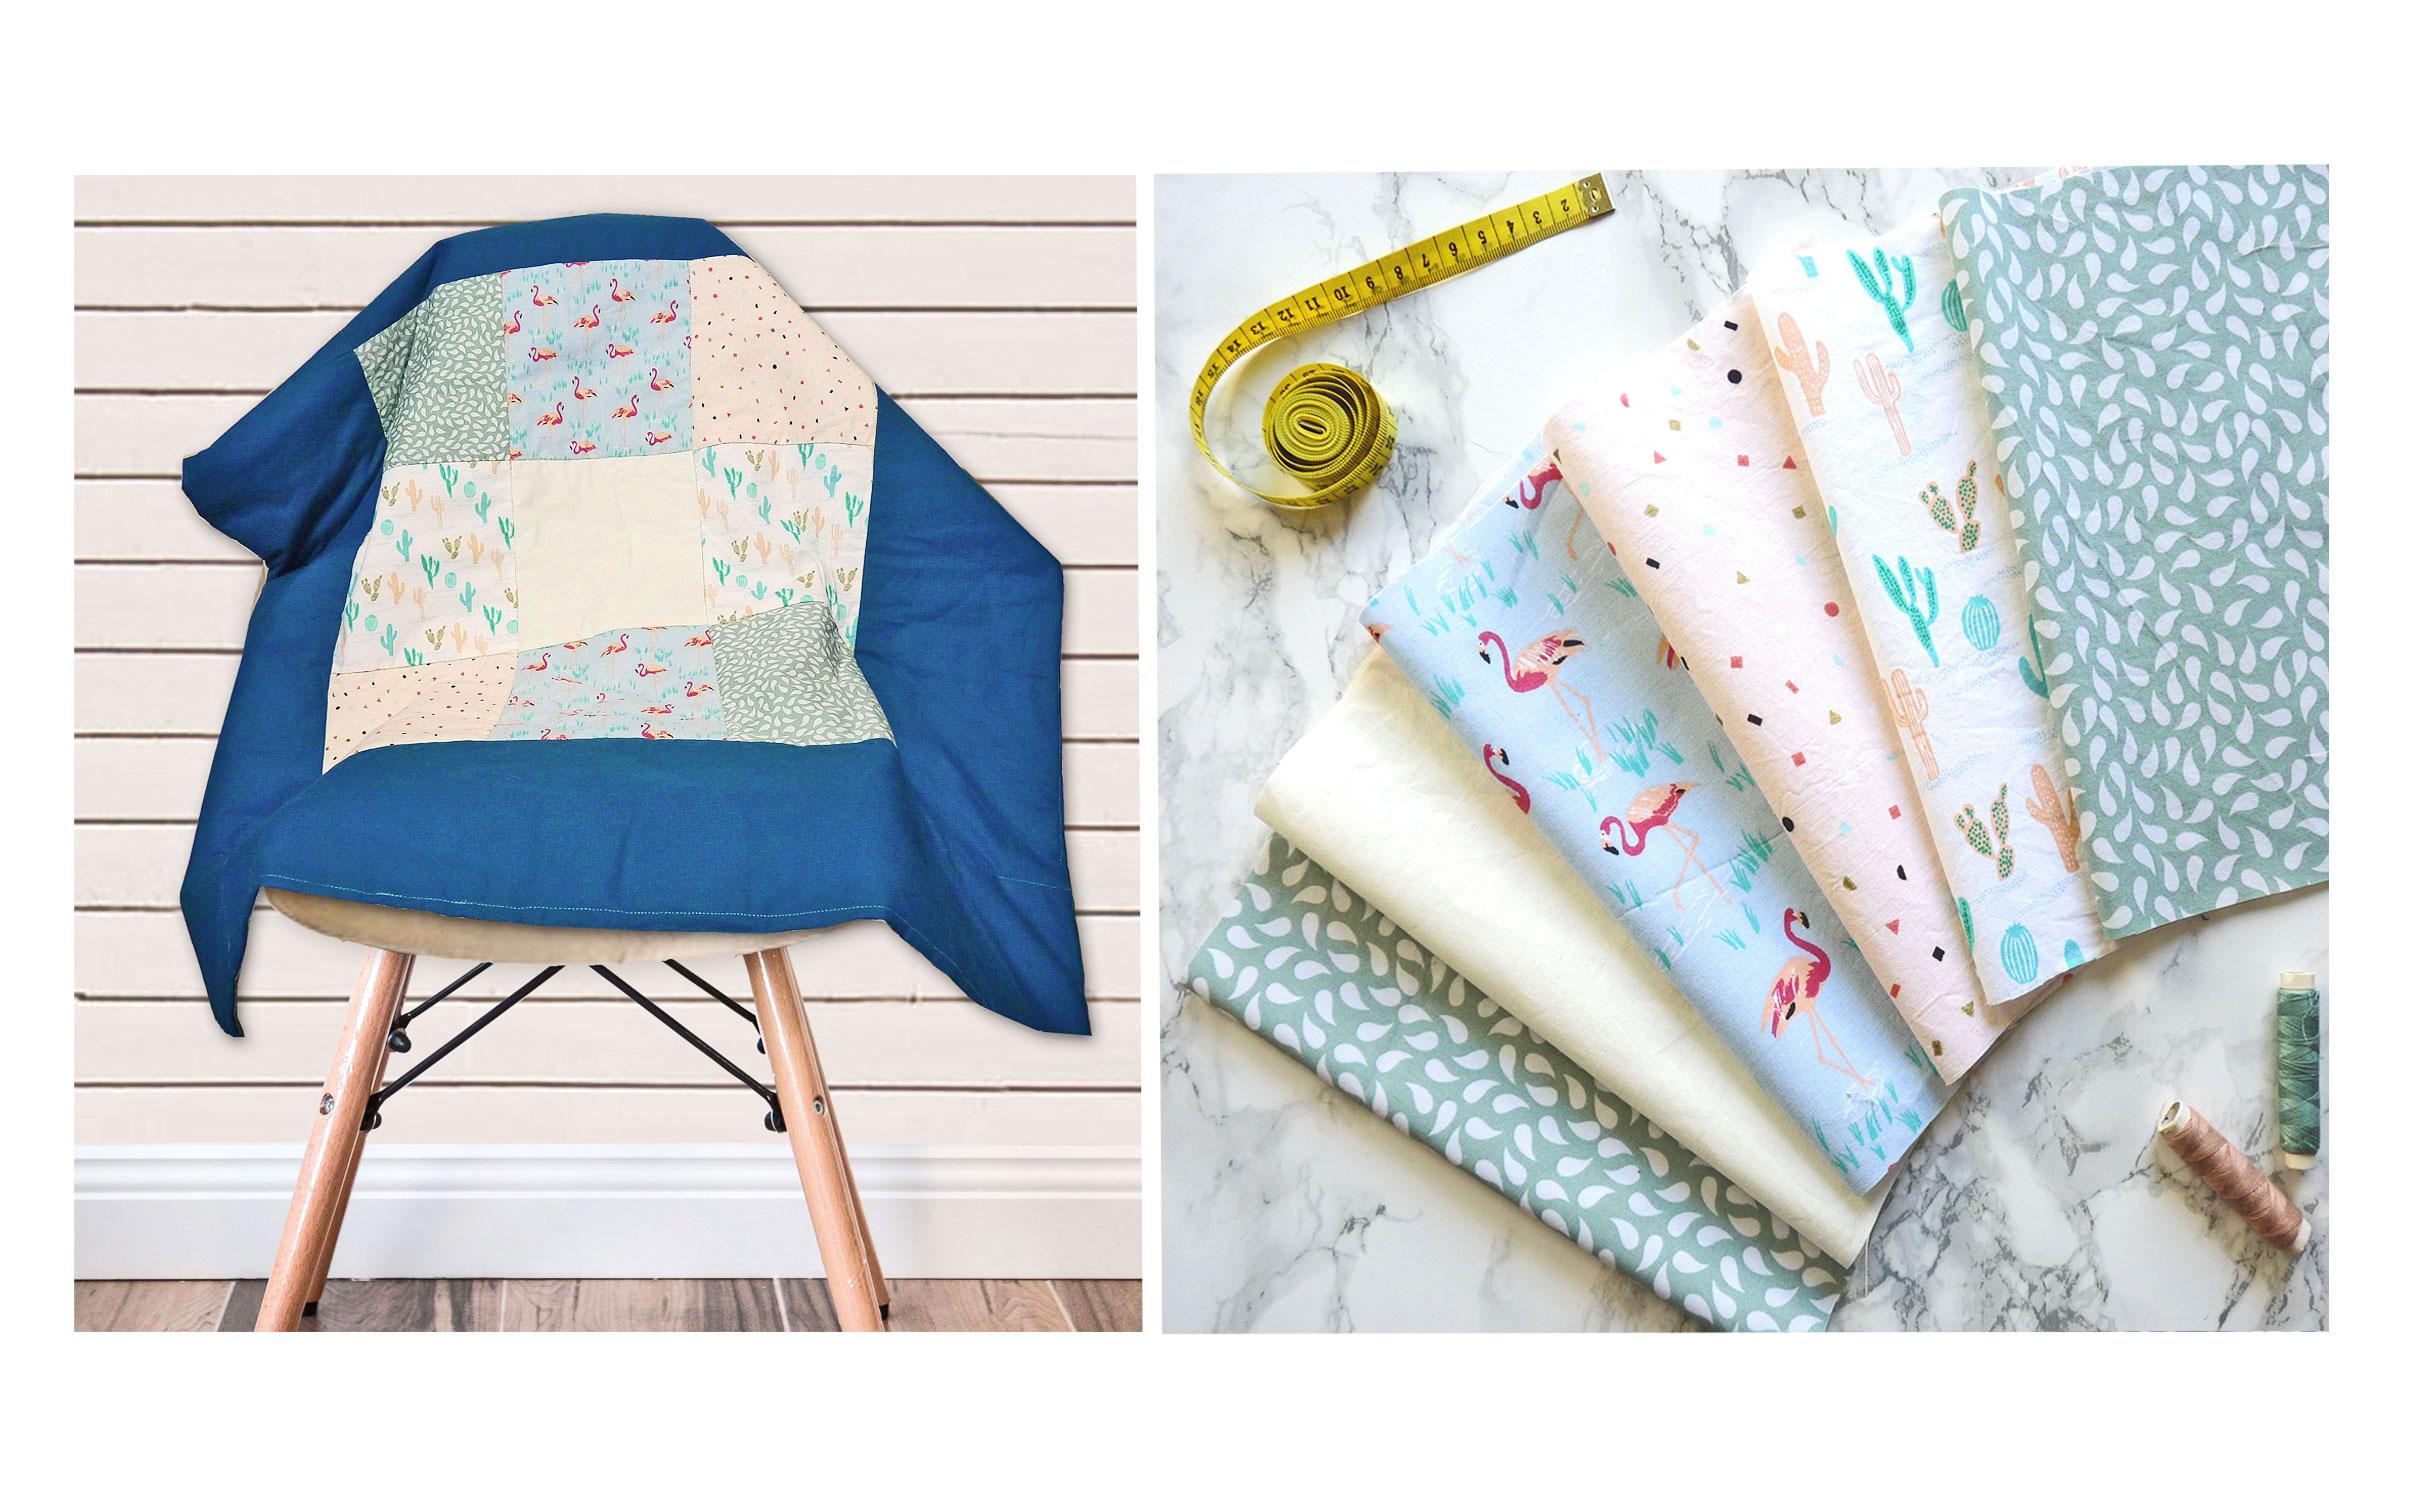 Baby Patchworkdecke ohne Schnittmuster nähen – Anleitung